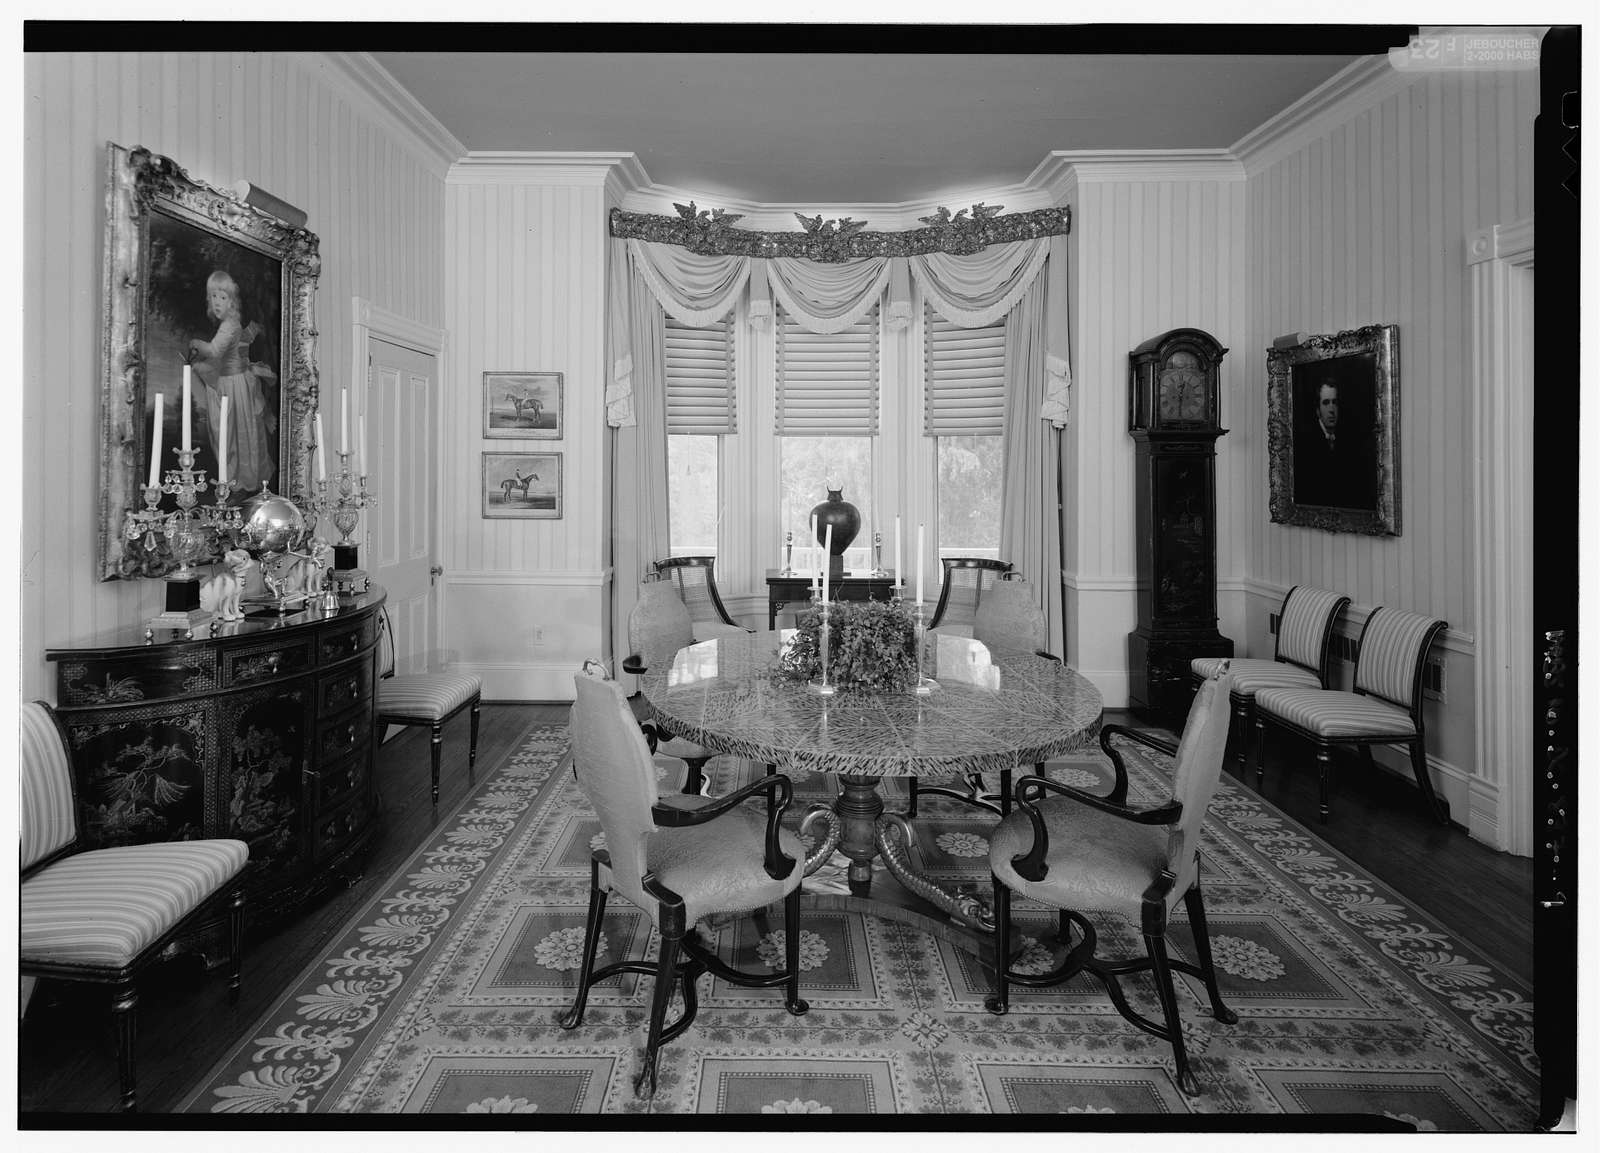 Dougal House, 3259 R Street, Northwest, Washington, District of Columbia, DC